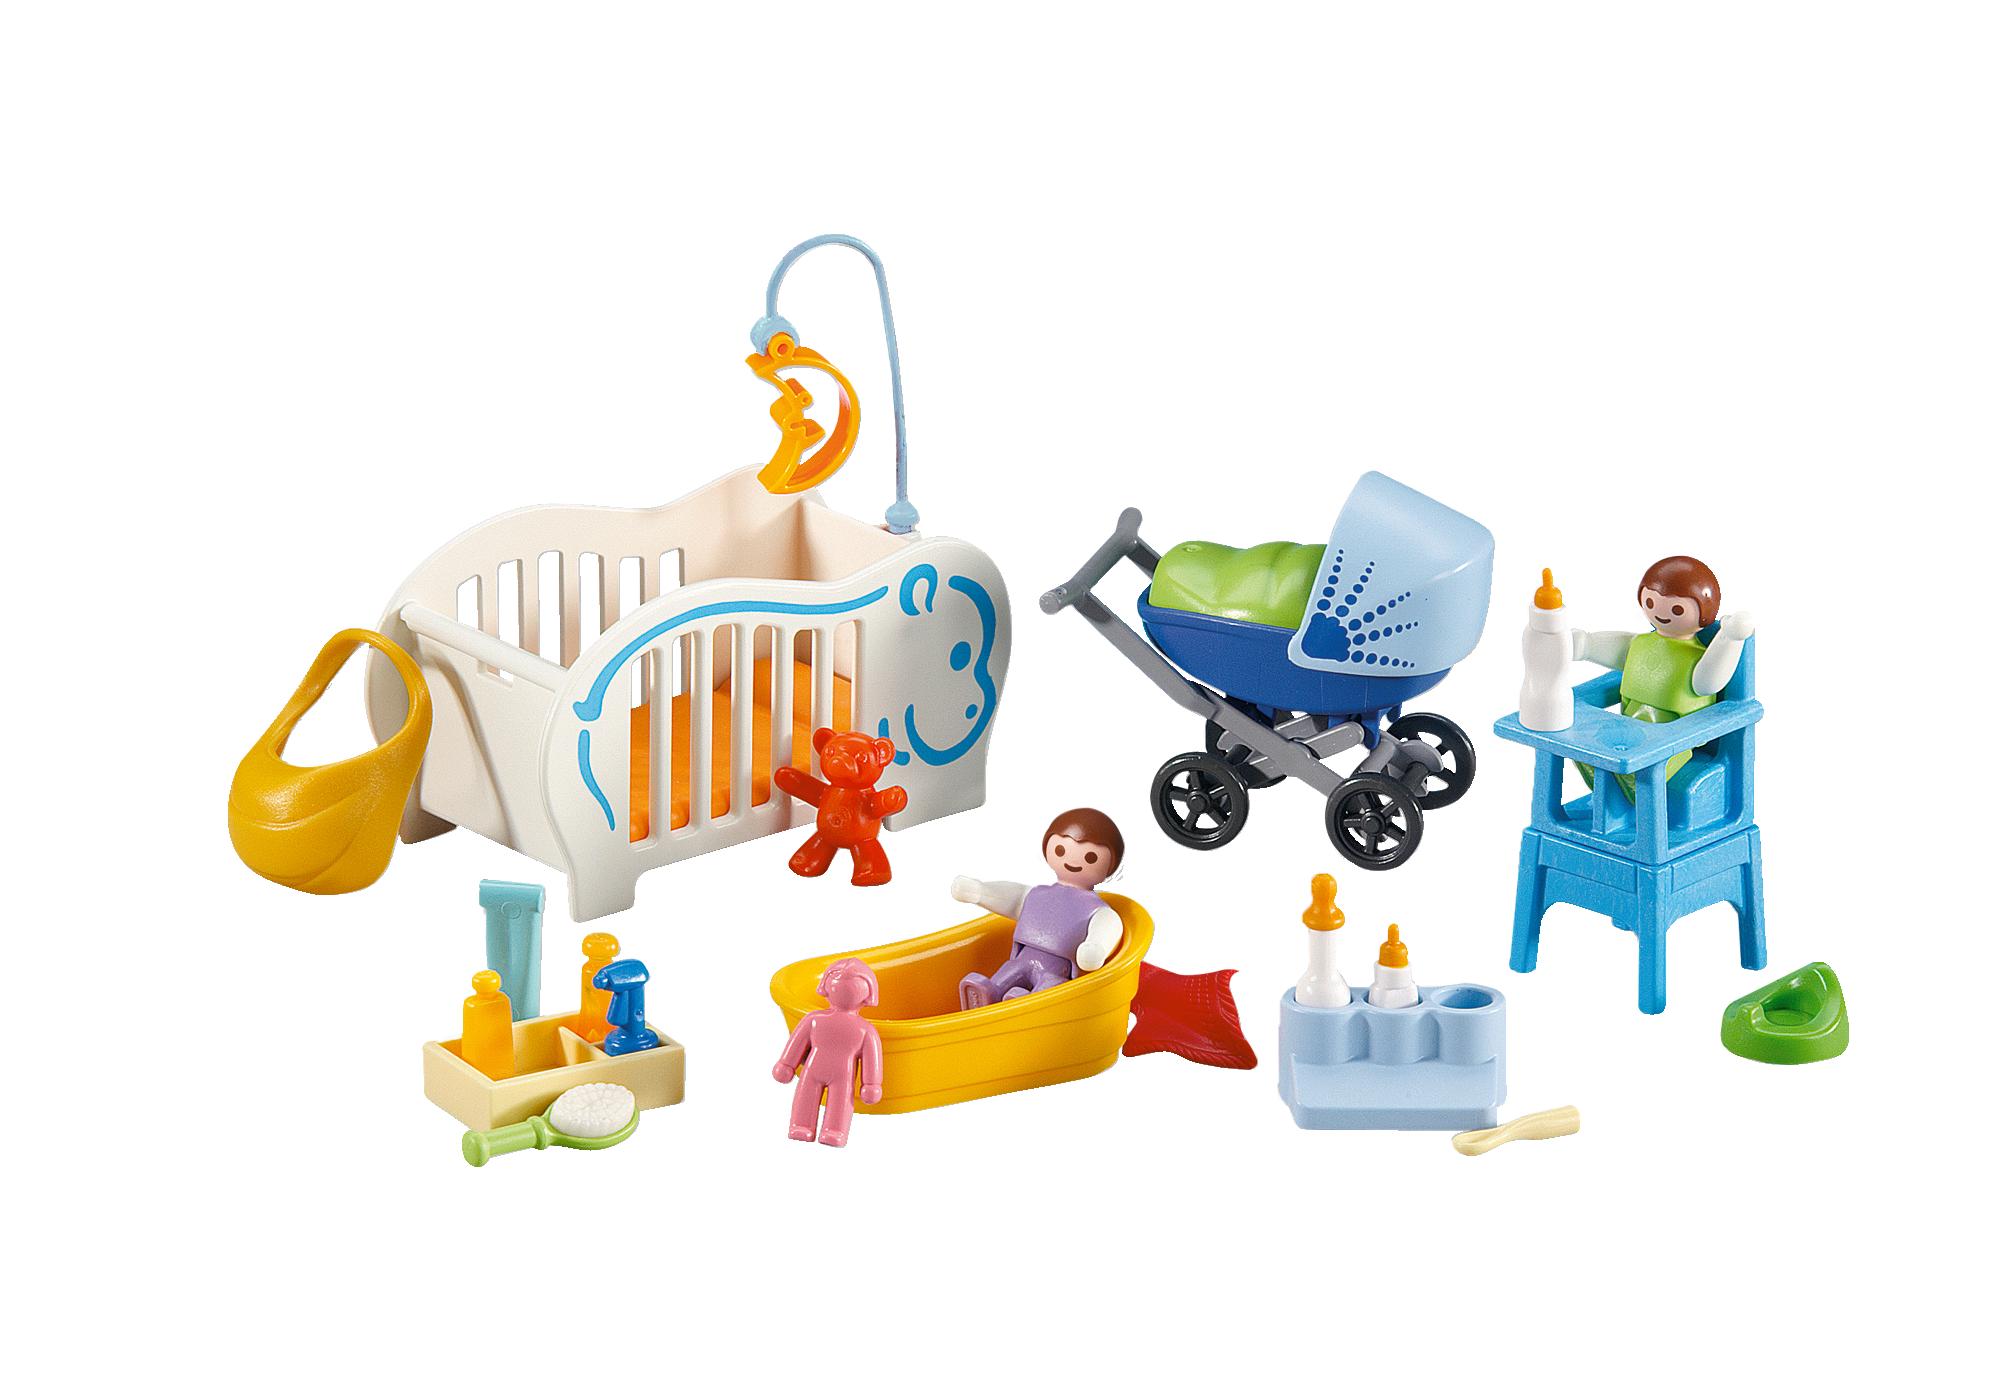 http://media.playmobil.com/i/playmobil/6226_product_detail/2 Bebés y Complementos para su Cuidado